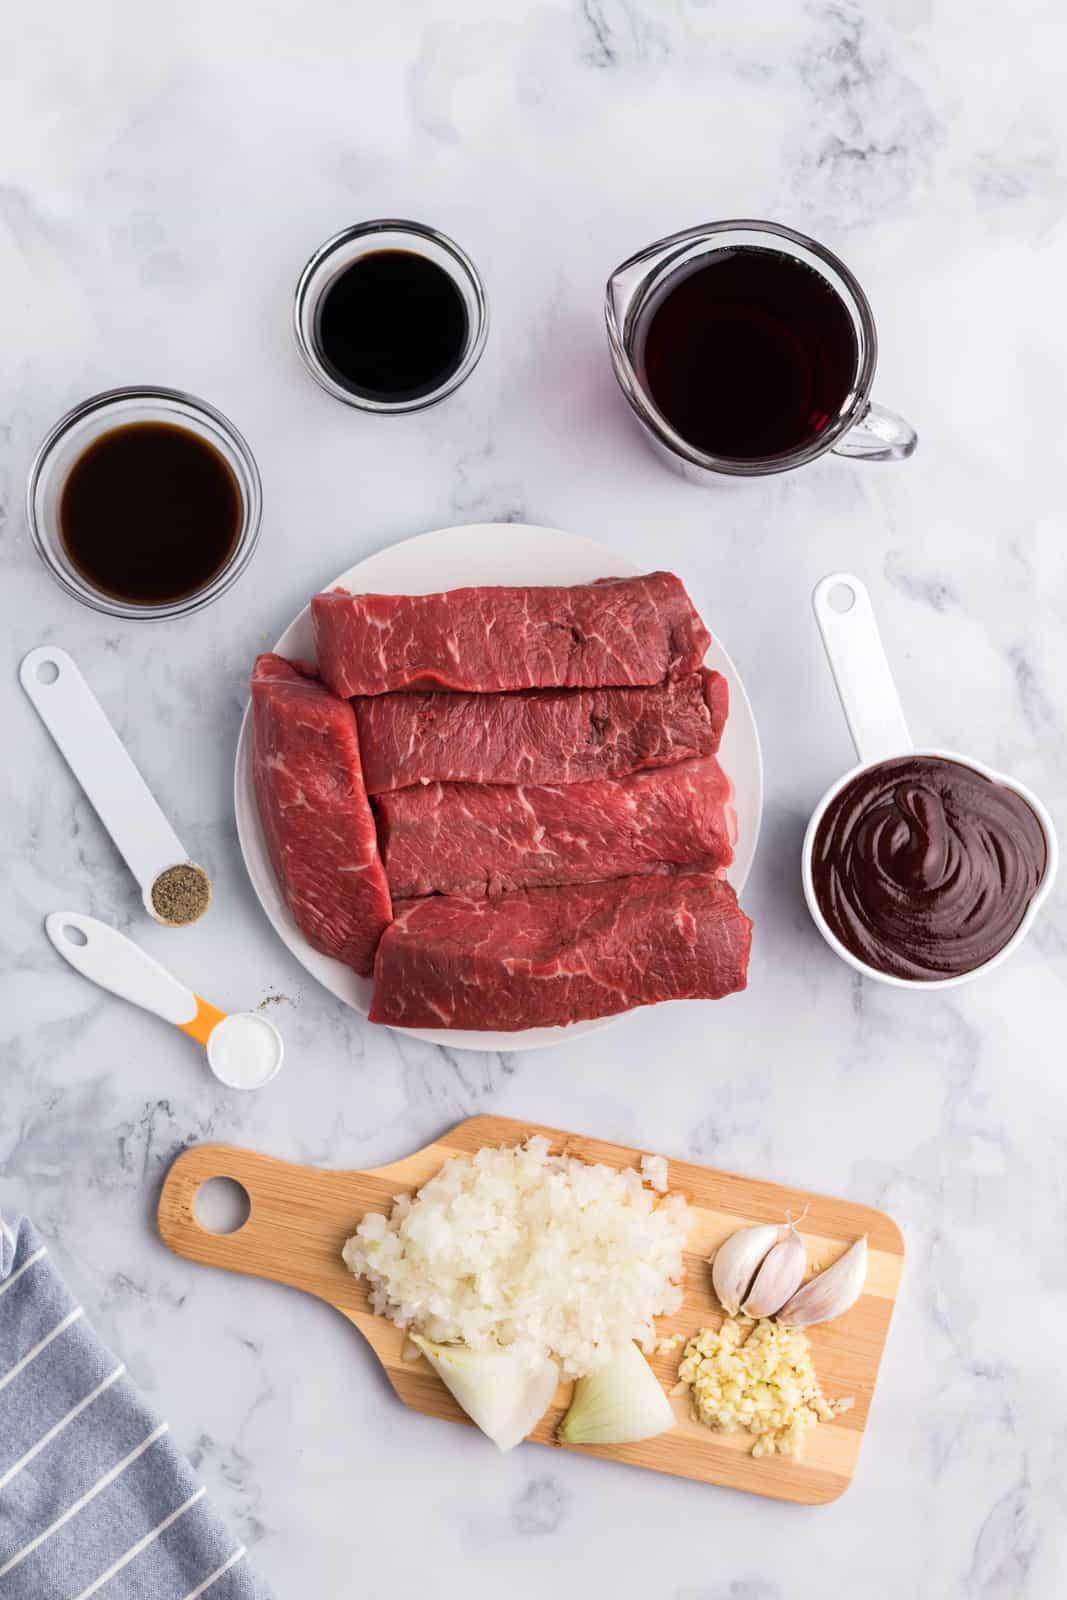 Ingredients needed for Slow Cooker Beef Short Ribs